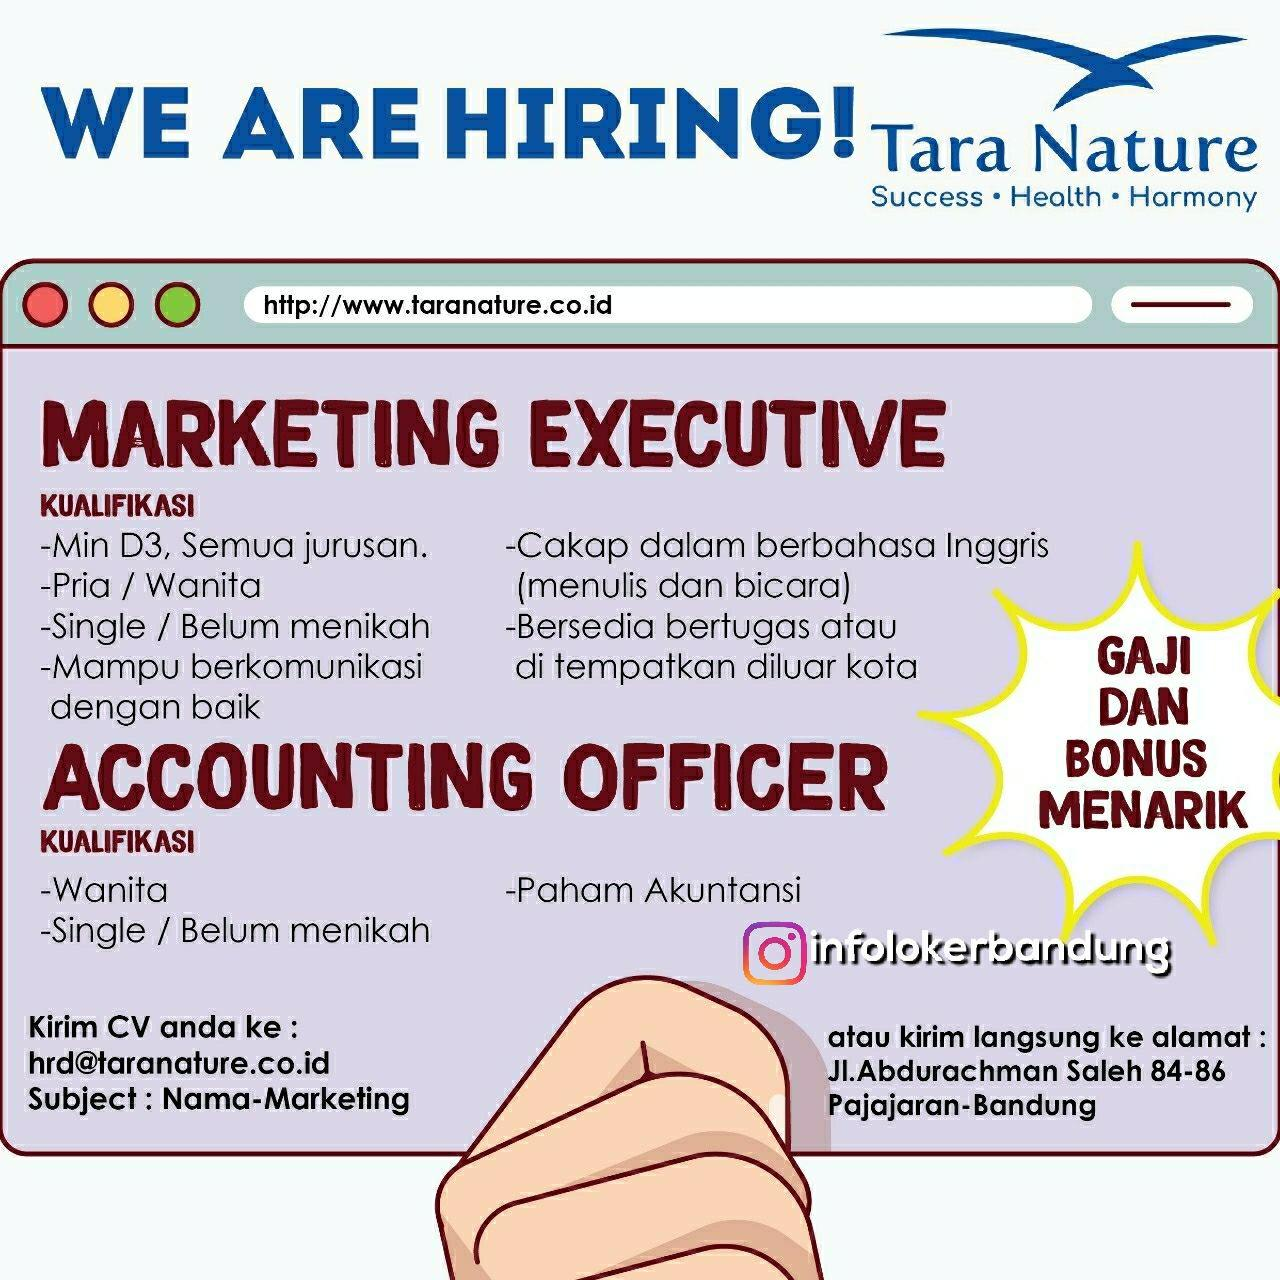 Lowongan Kerja Tara Nature Bandung April 2018